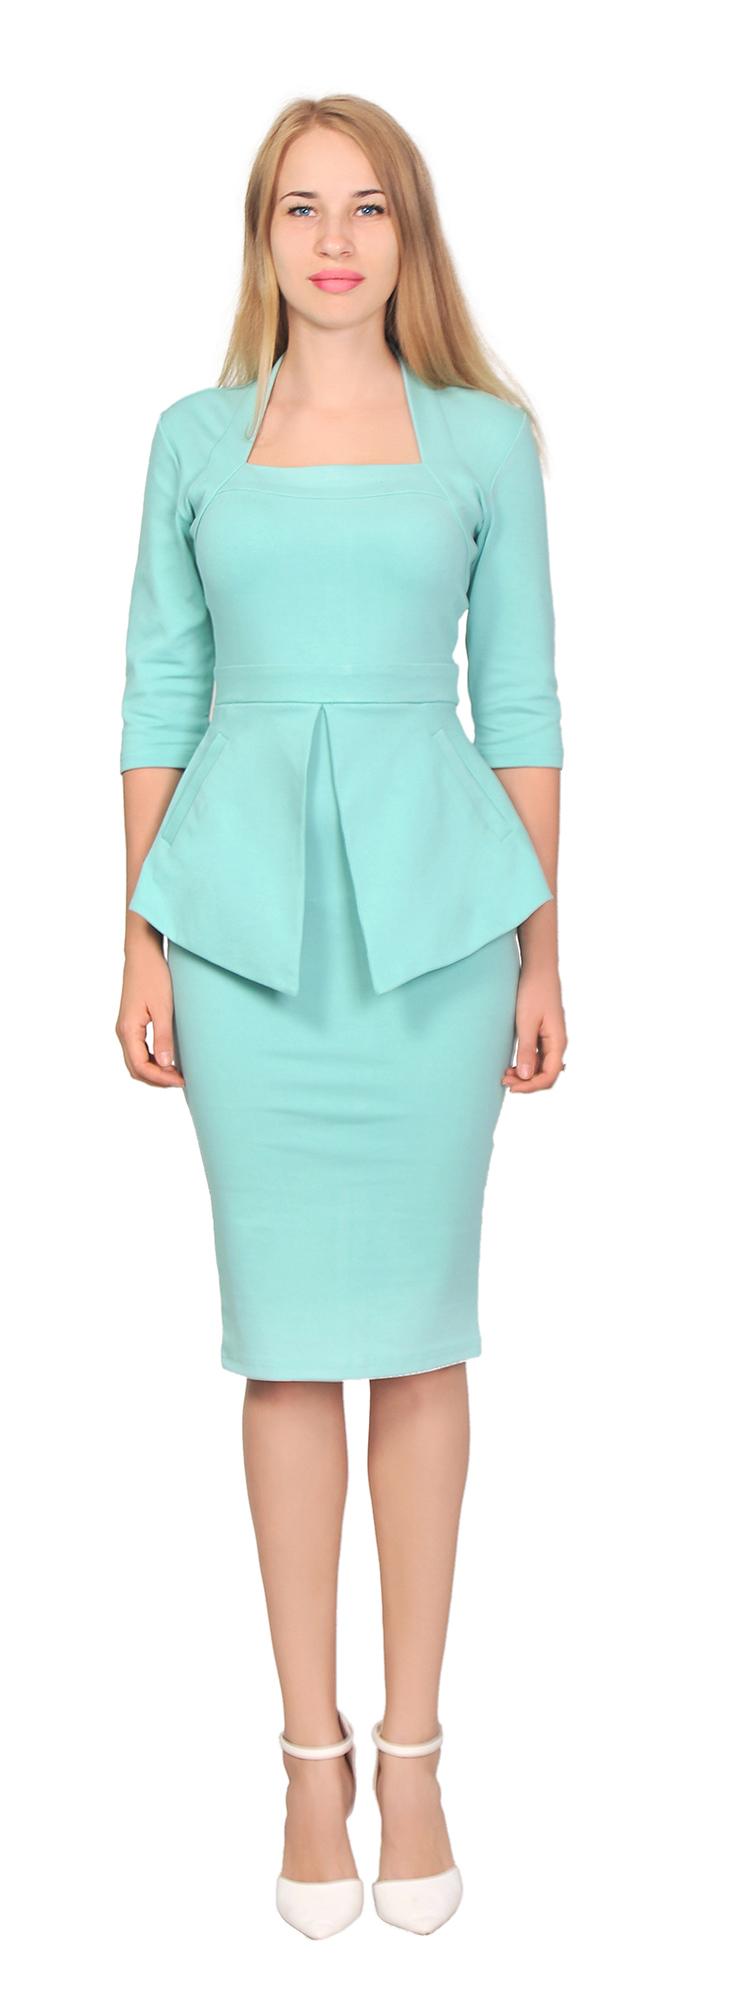 WOMEN\'S ELEGANT PEPLUM DRESS WORK OFFICE VINTAGE PENCIL 1950S ...